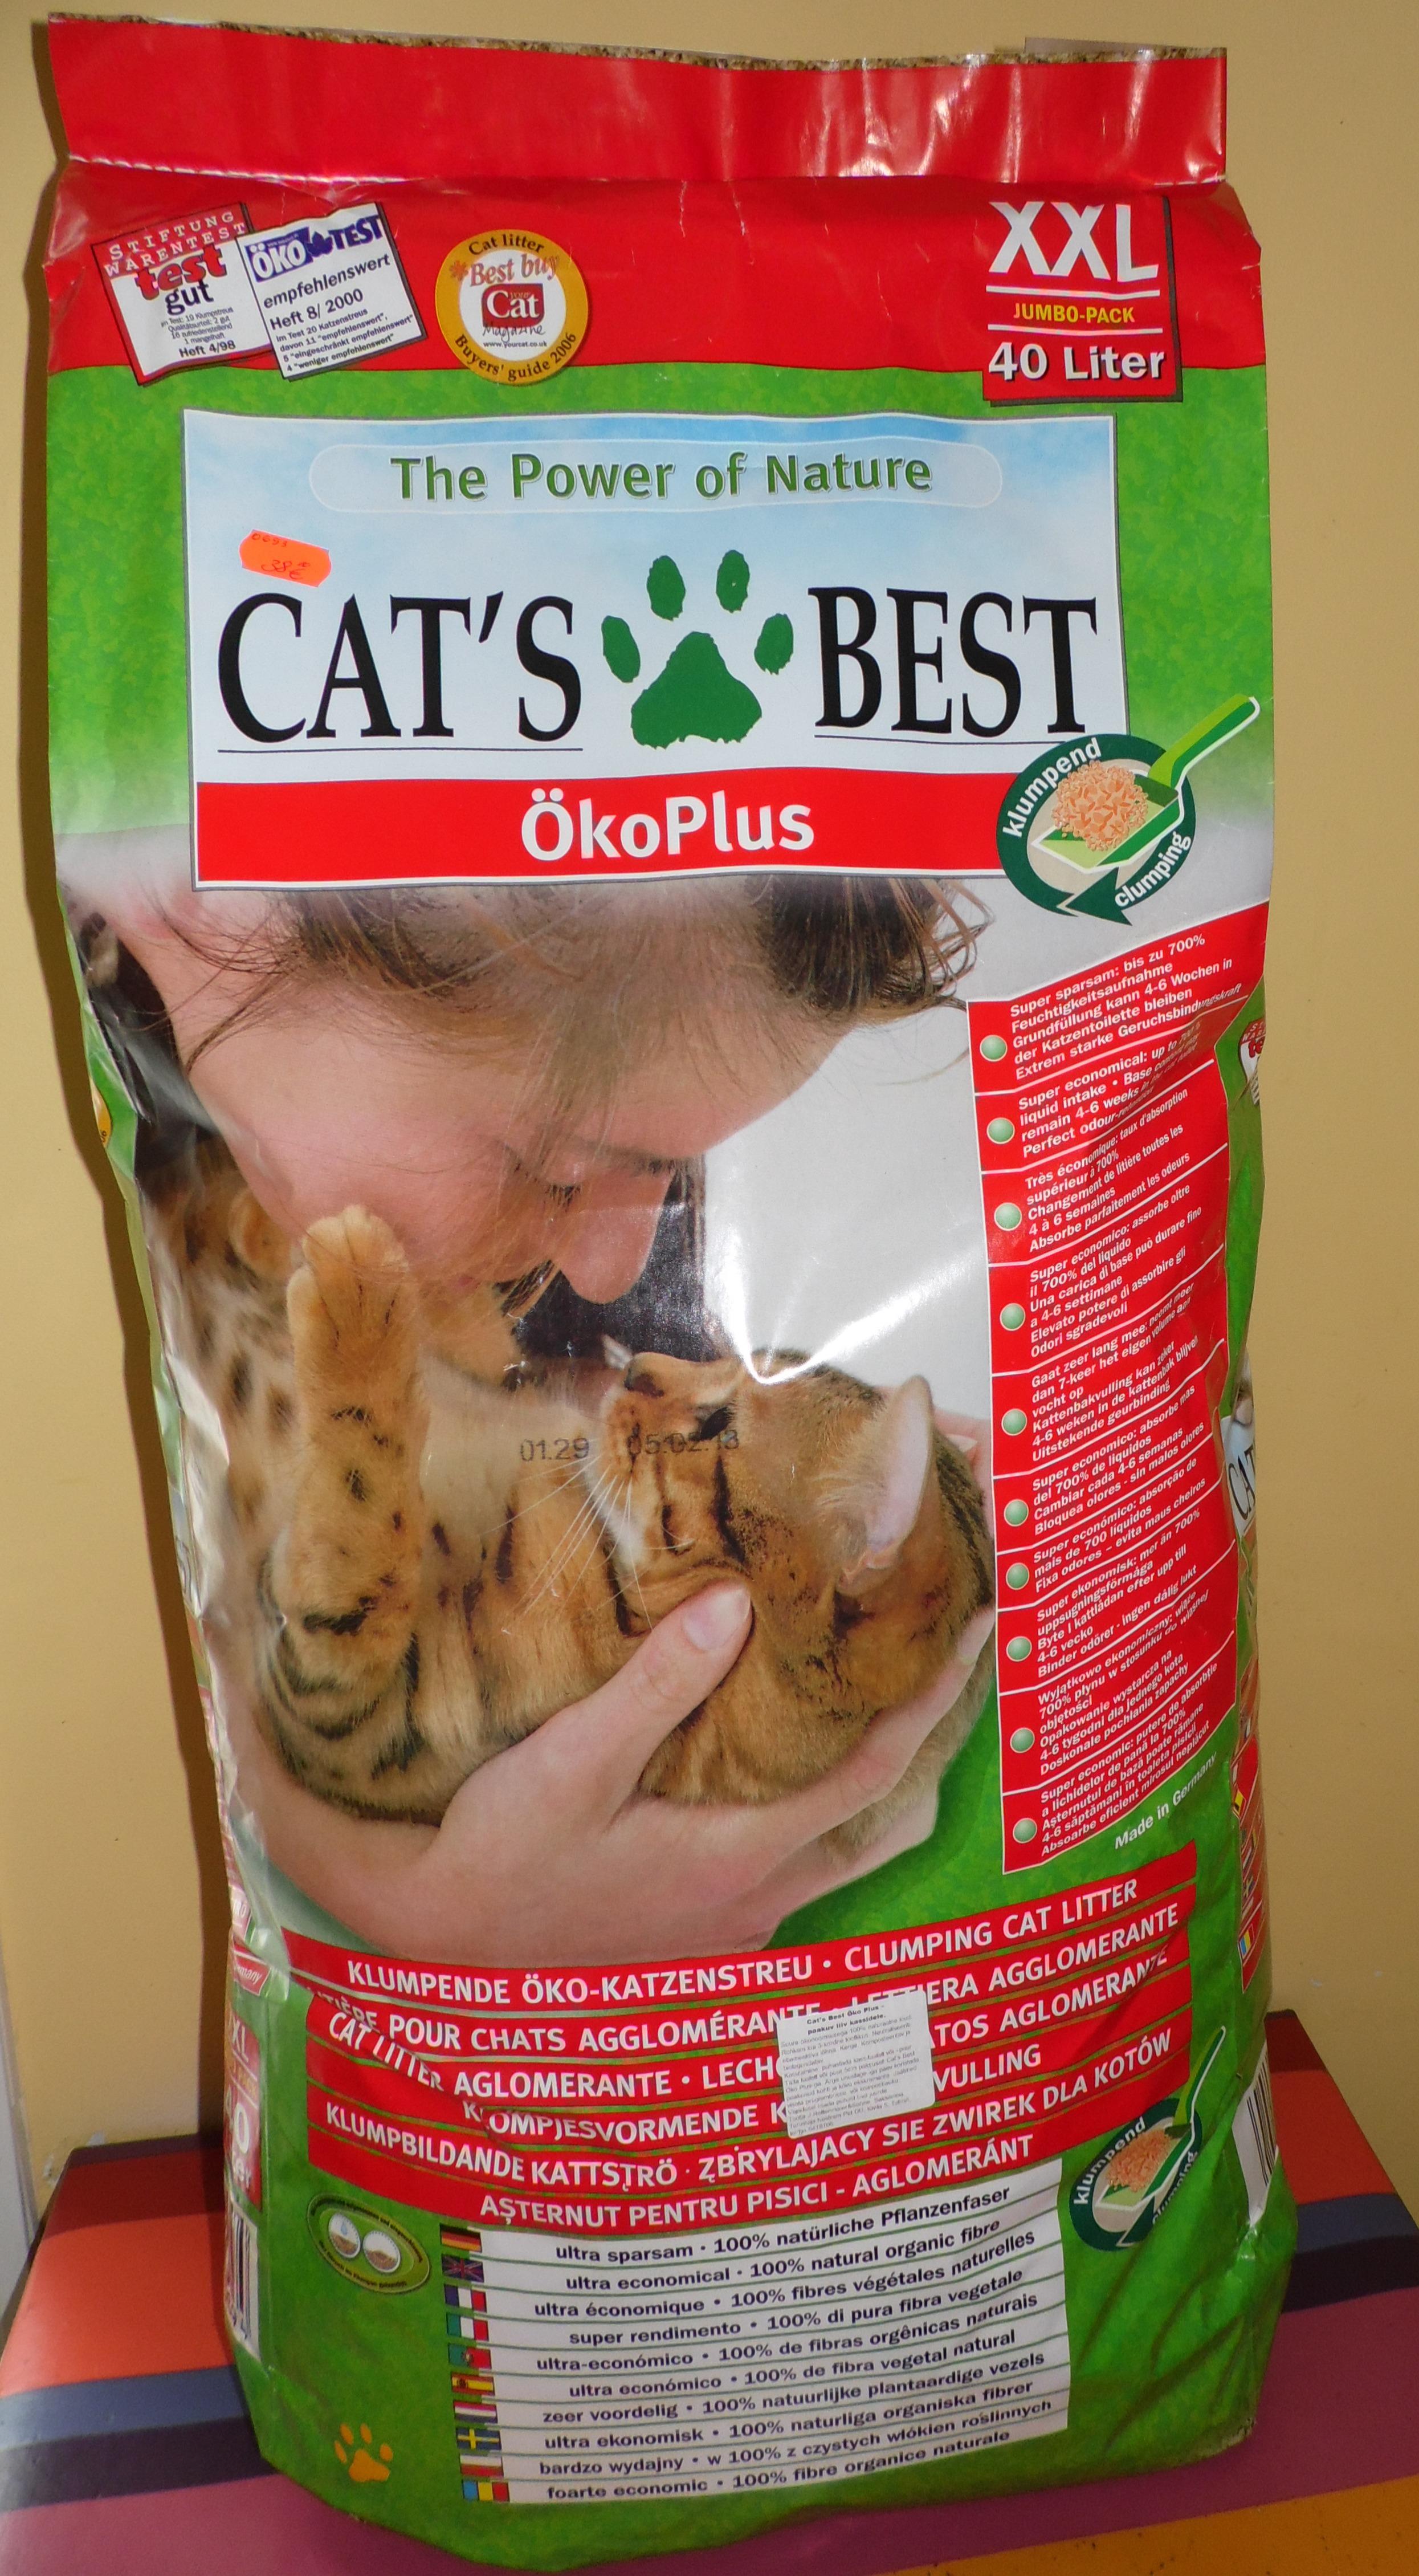 Cat's Best ÖkoPlus